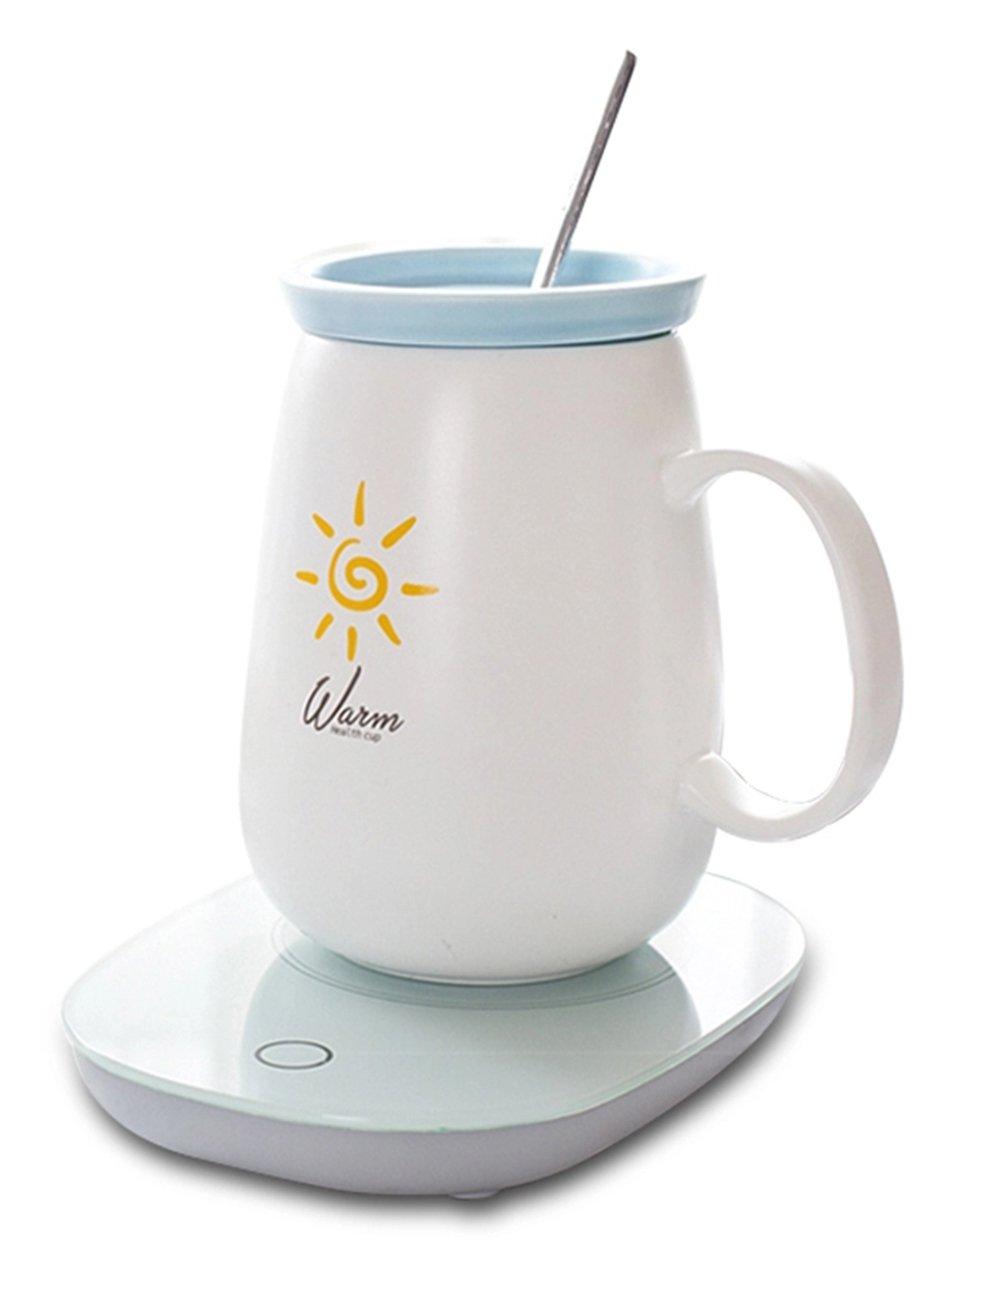 Auto Shut On / Off Coffee Beverage Mug Warmer - BZY1 Electric Constant Temperature 55℃/131℉ Waterproof Cup Heater (Include Coffee Mug & Spoon)